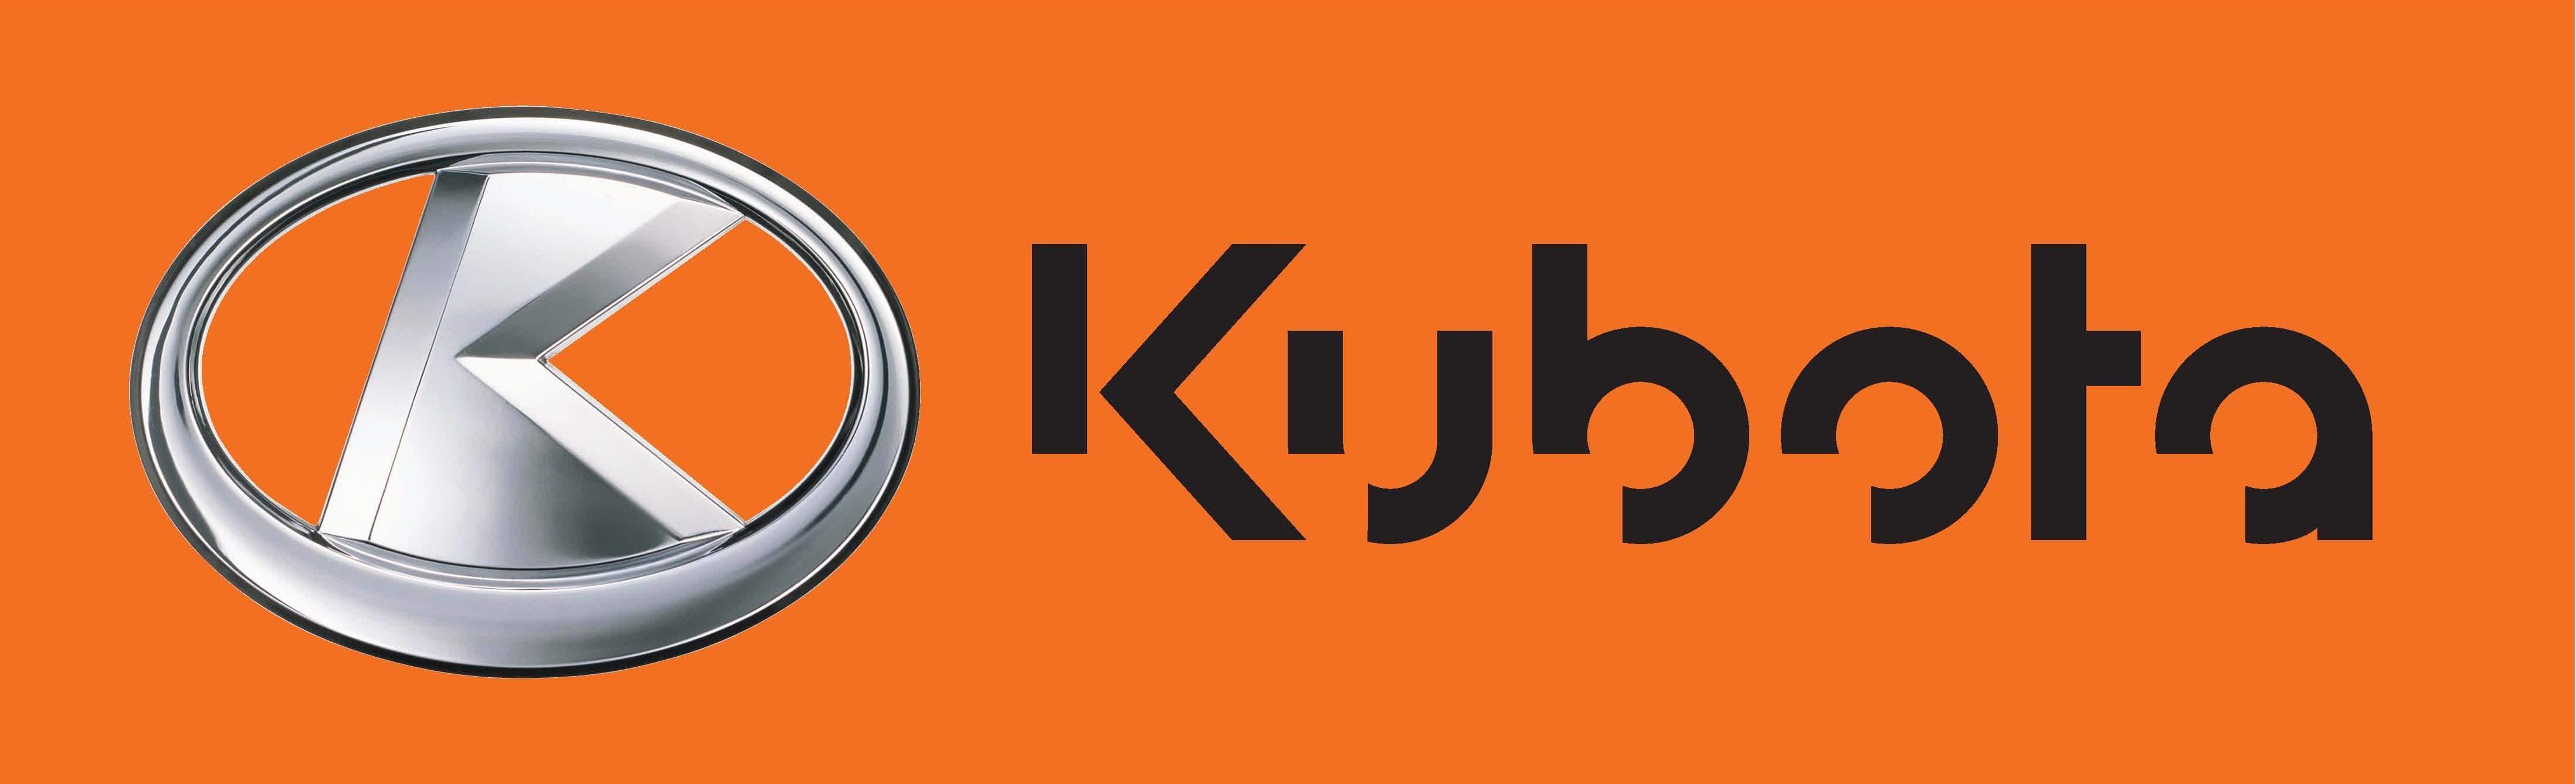 kubota video logo